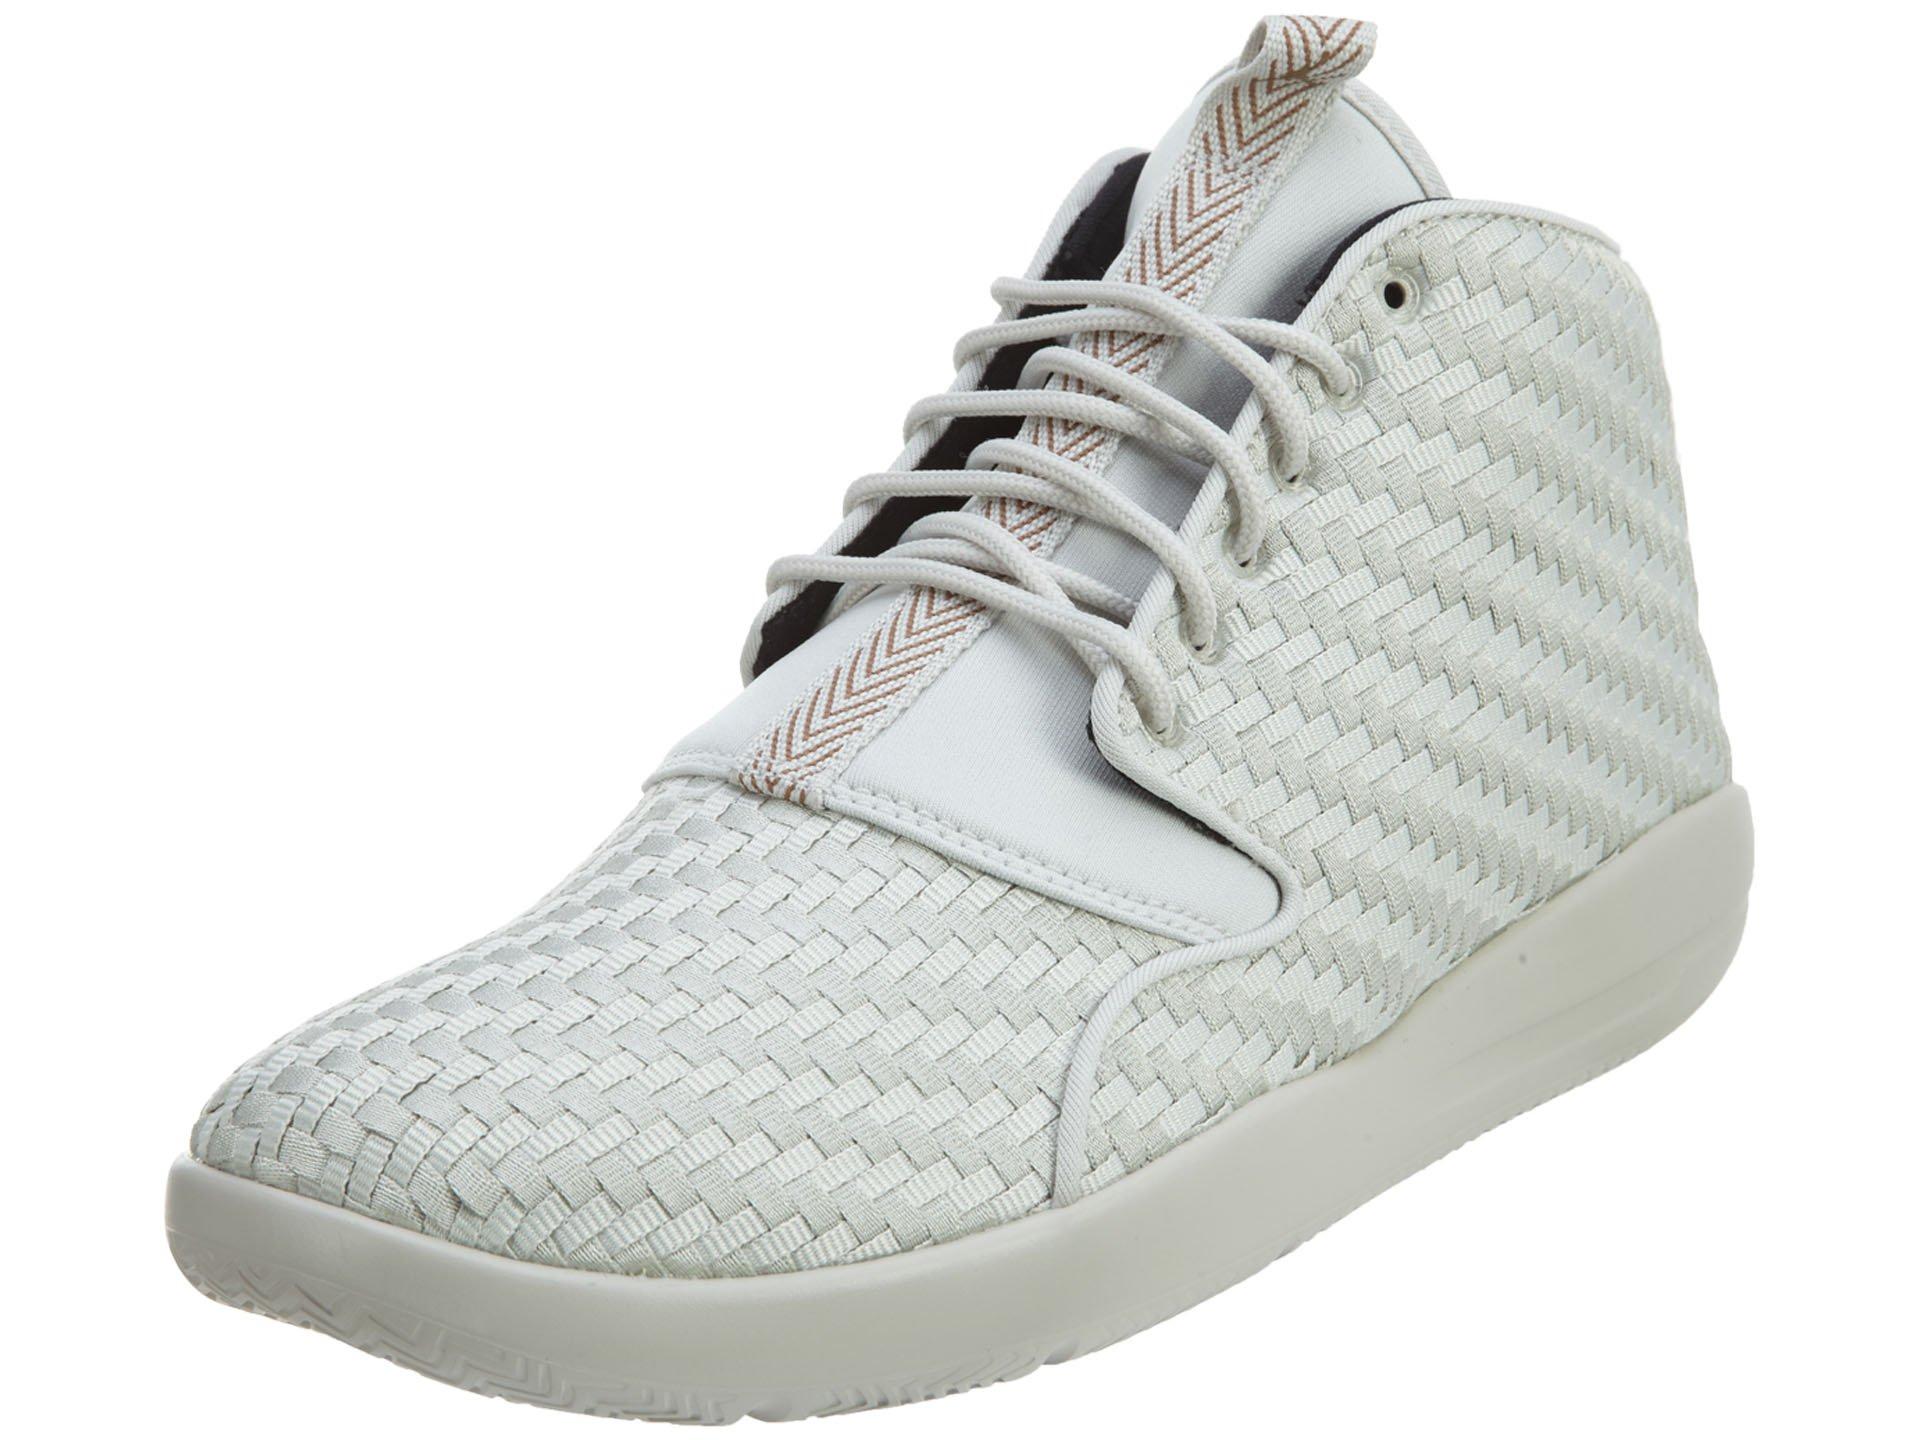 4455153d131 Galleon - Jordan Nike Men's Eclipse Chukka Light Bone/Golden Beige/Black  Basketball Shoe 9 Men US